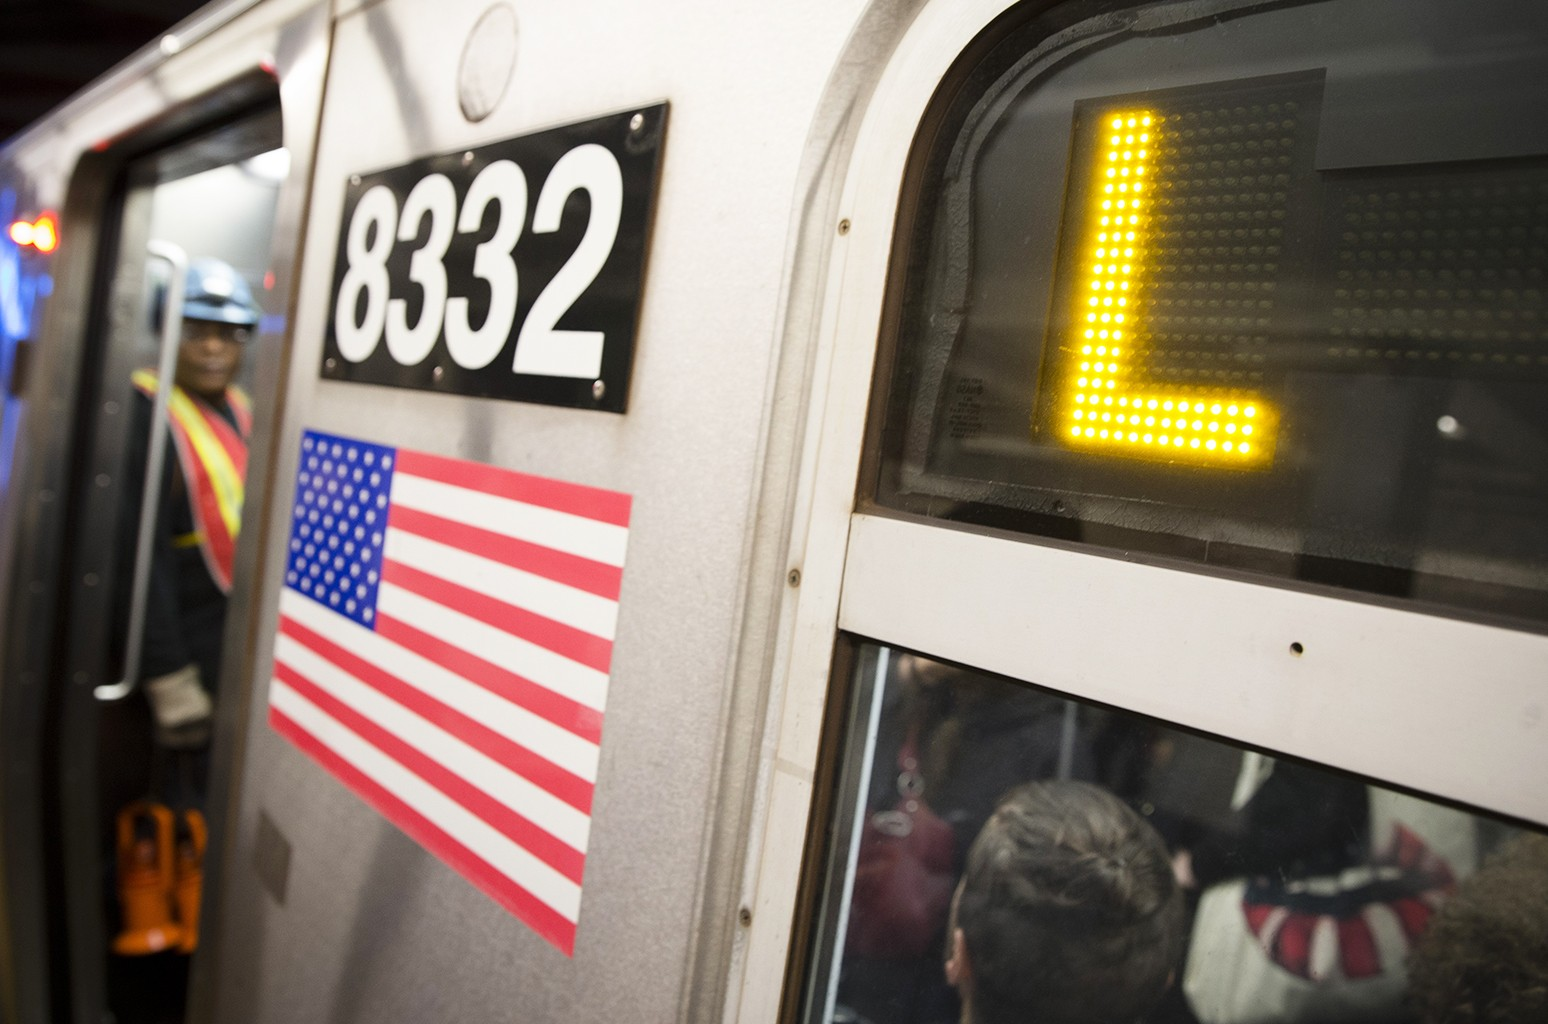 L-Train subway car